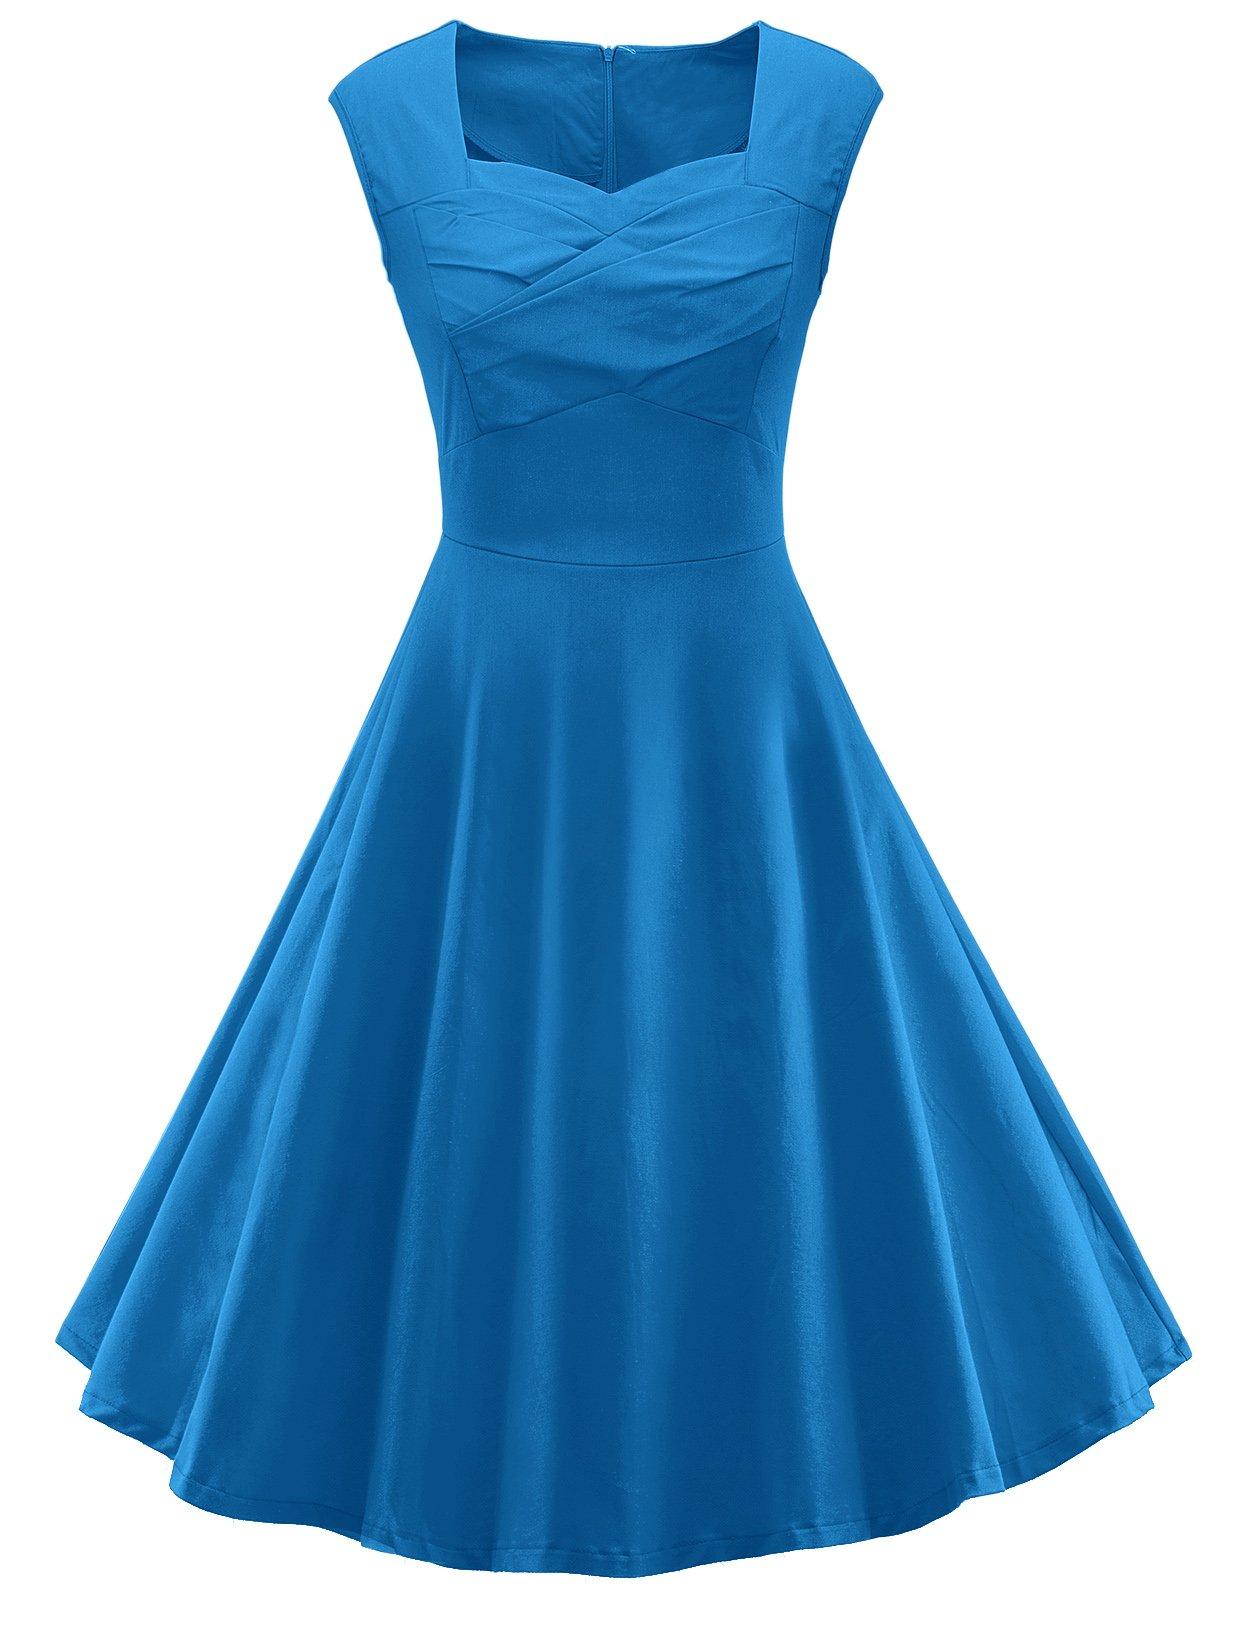 V fashion Women 1950s Style Retro Cap Sleeve Garden Party Vintage Swing Dress, Blue 2XL